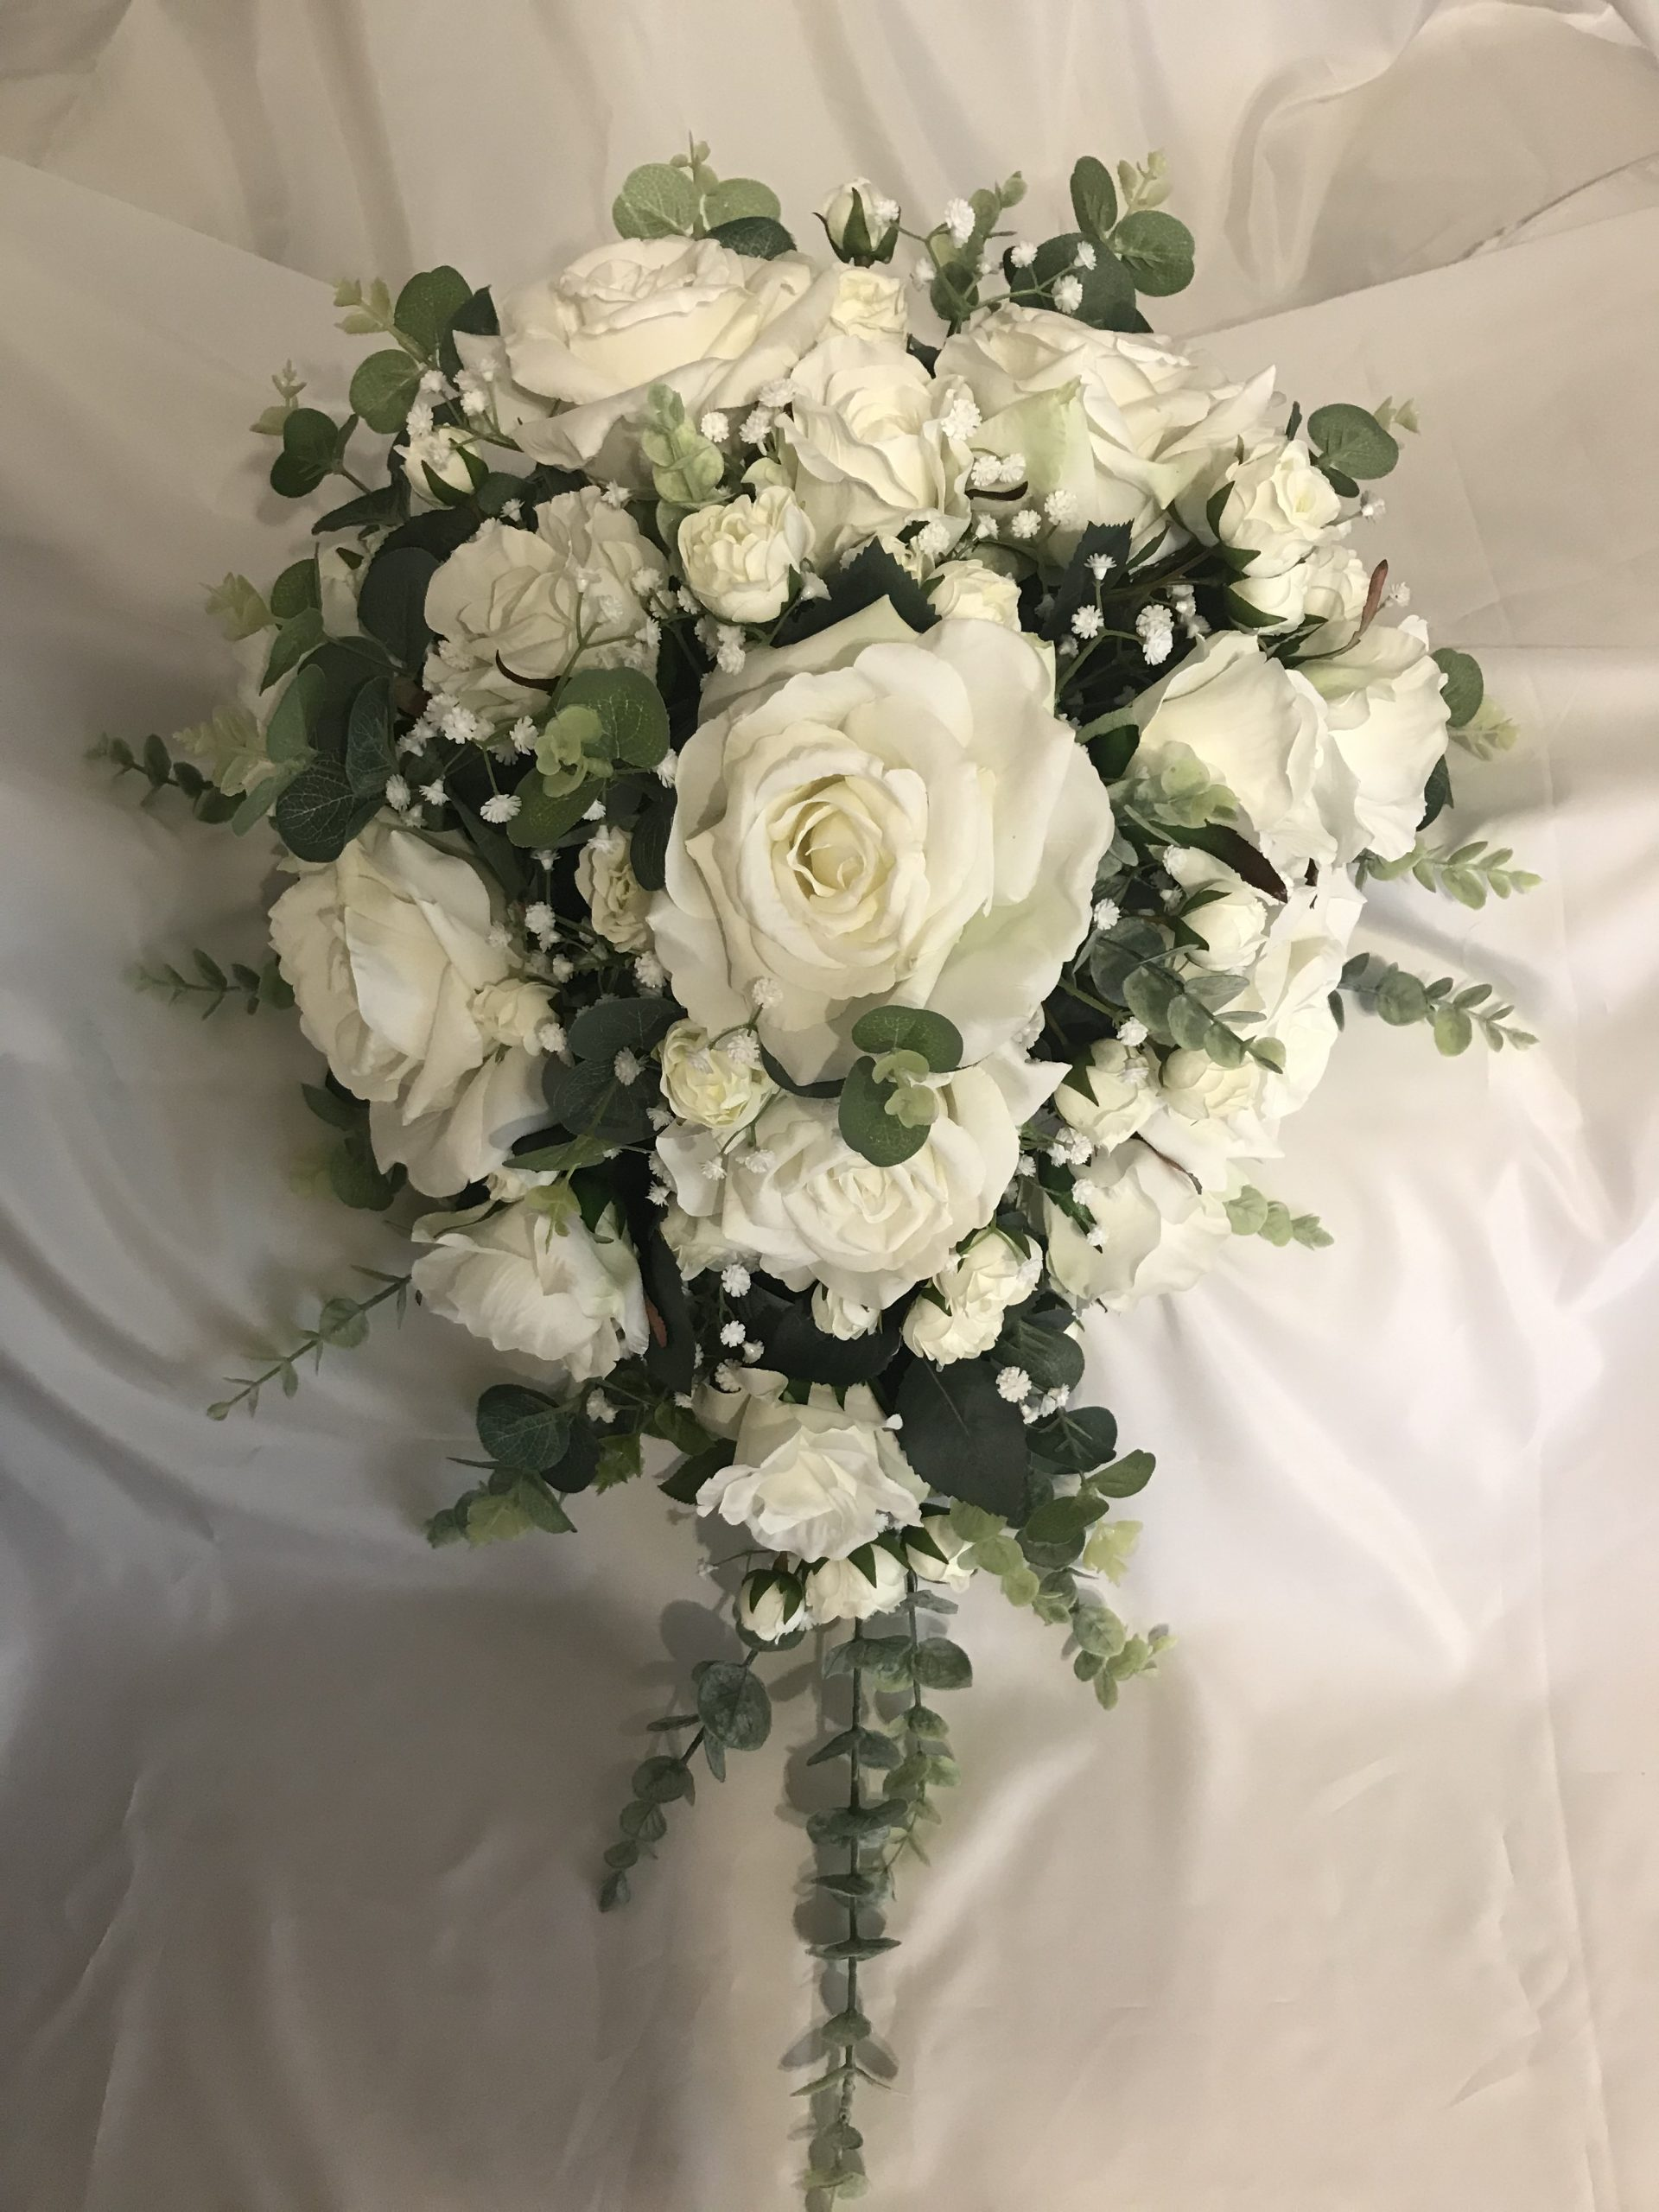 articifial bridesmaid bouquet